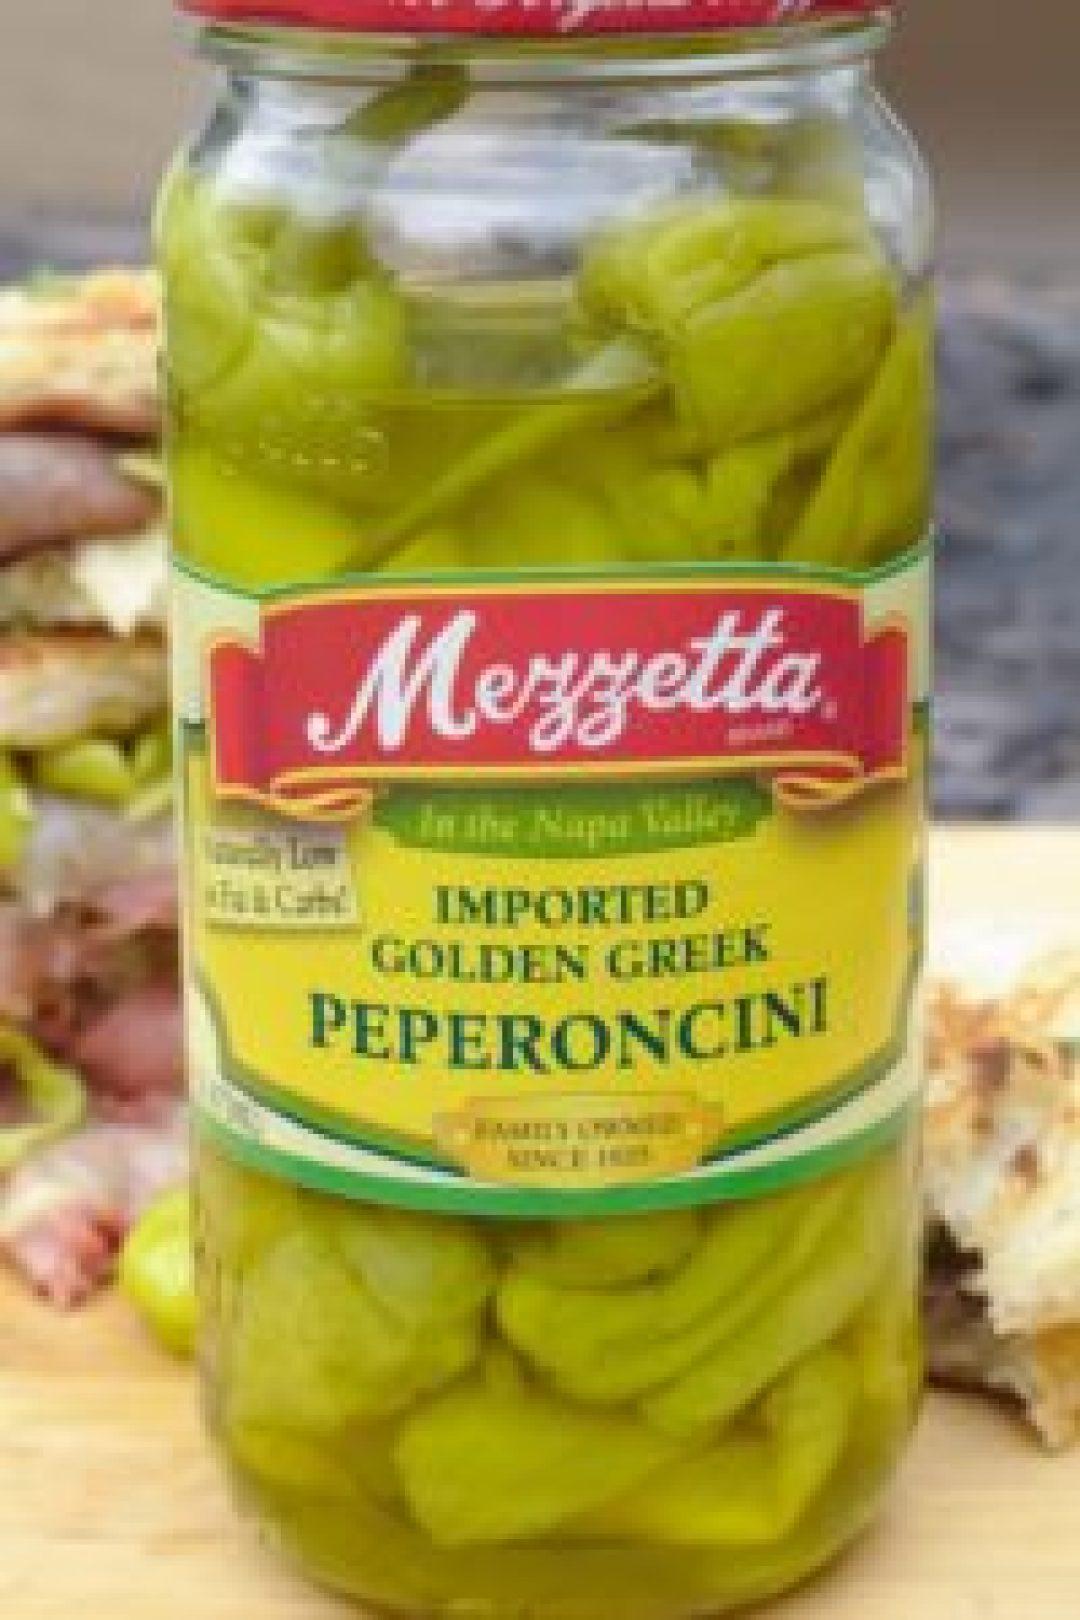 Mezzetta Peperoncini